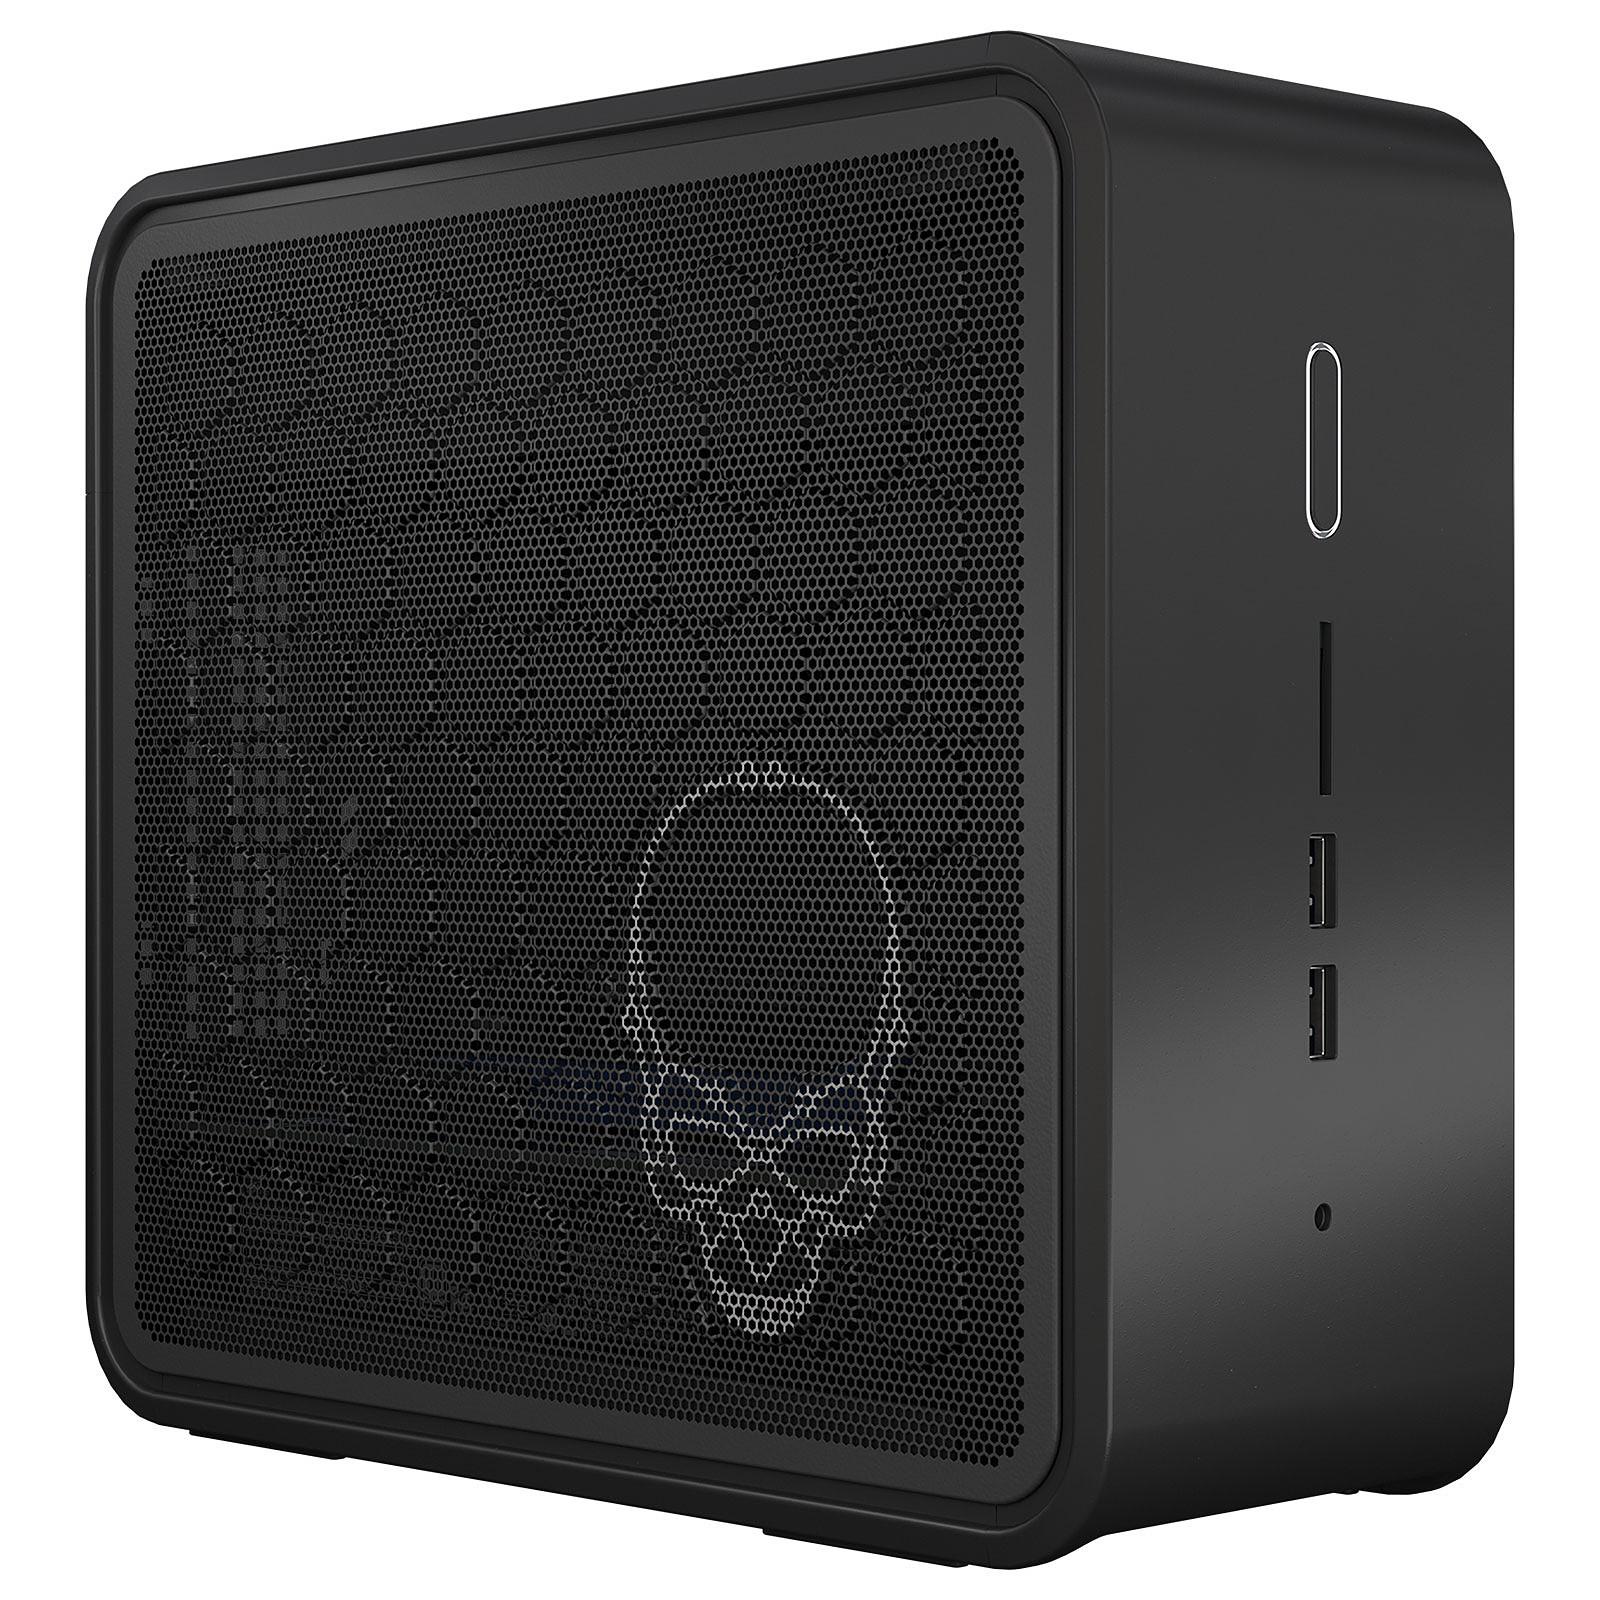 Intel NUC9 NUC9I9QNX1 (Ghost Canyon)